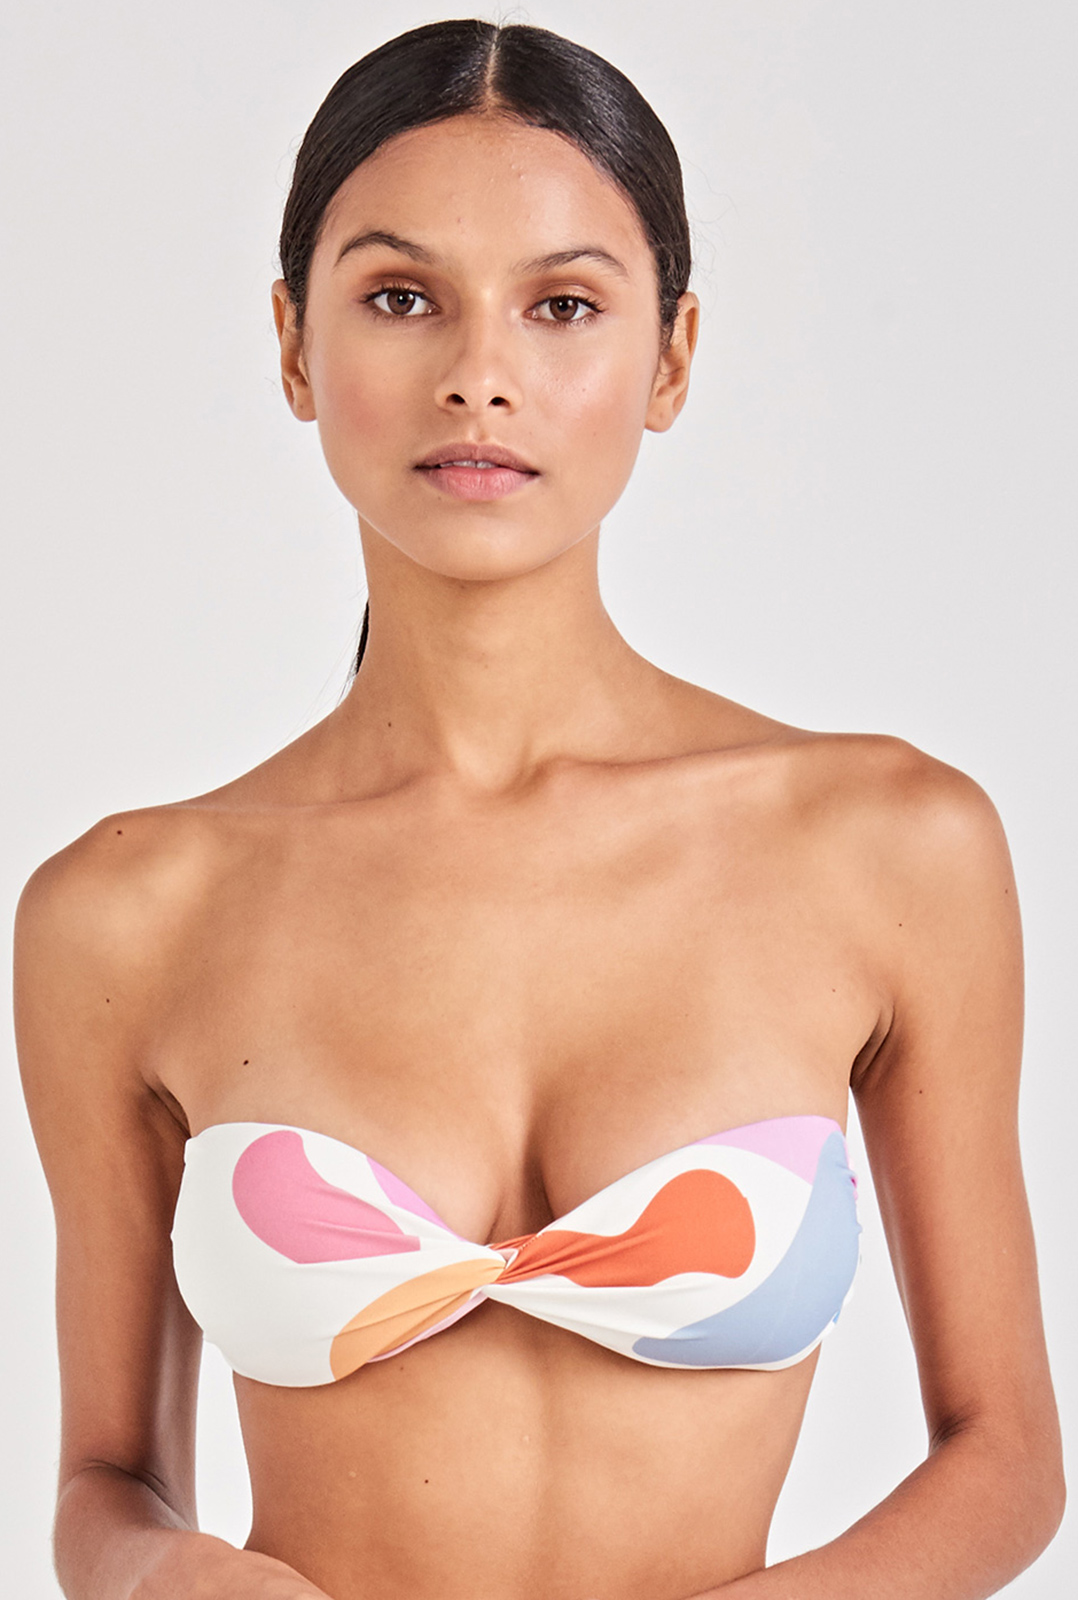 6b7f79453c582 Bikini Tops Colorful Bandeau Bikini Top - Top Alegria Artsy